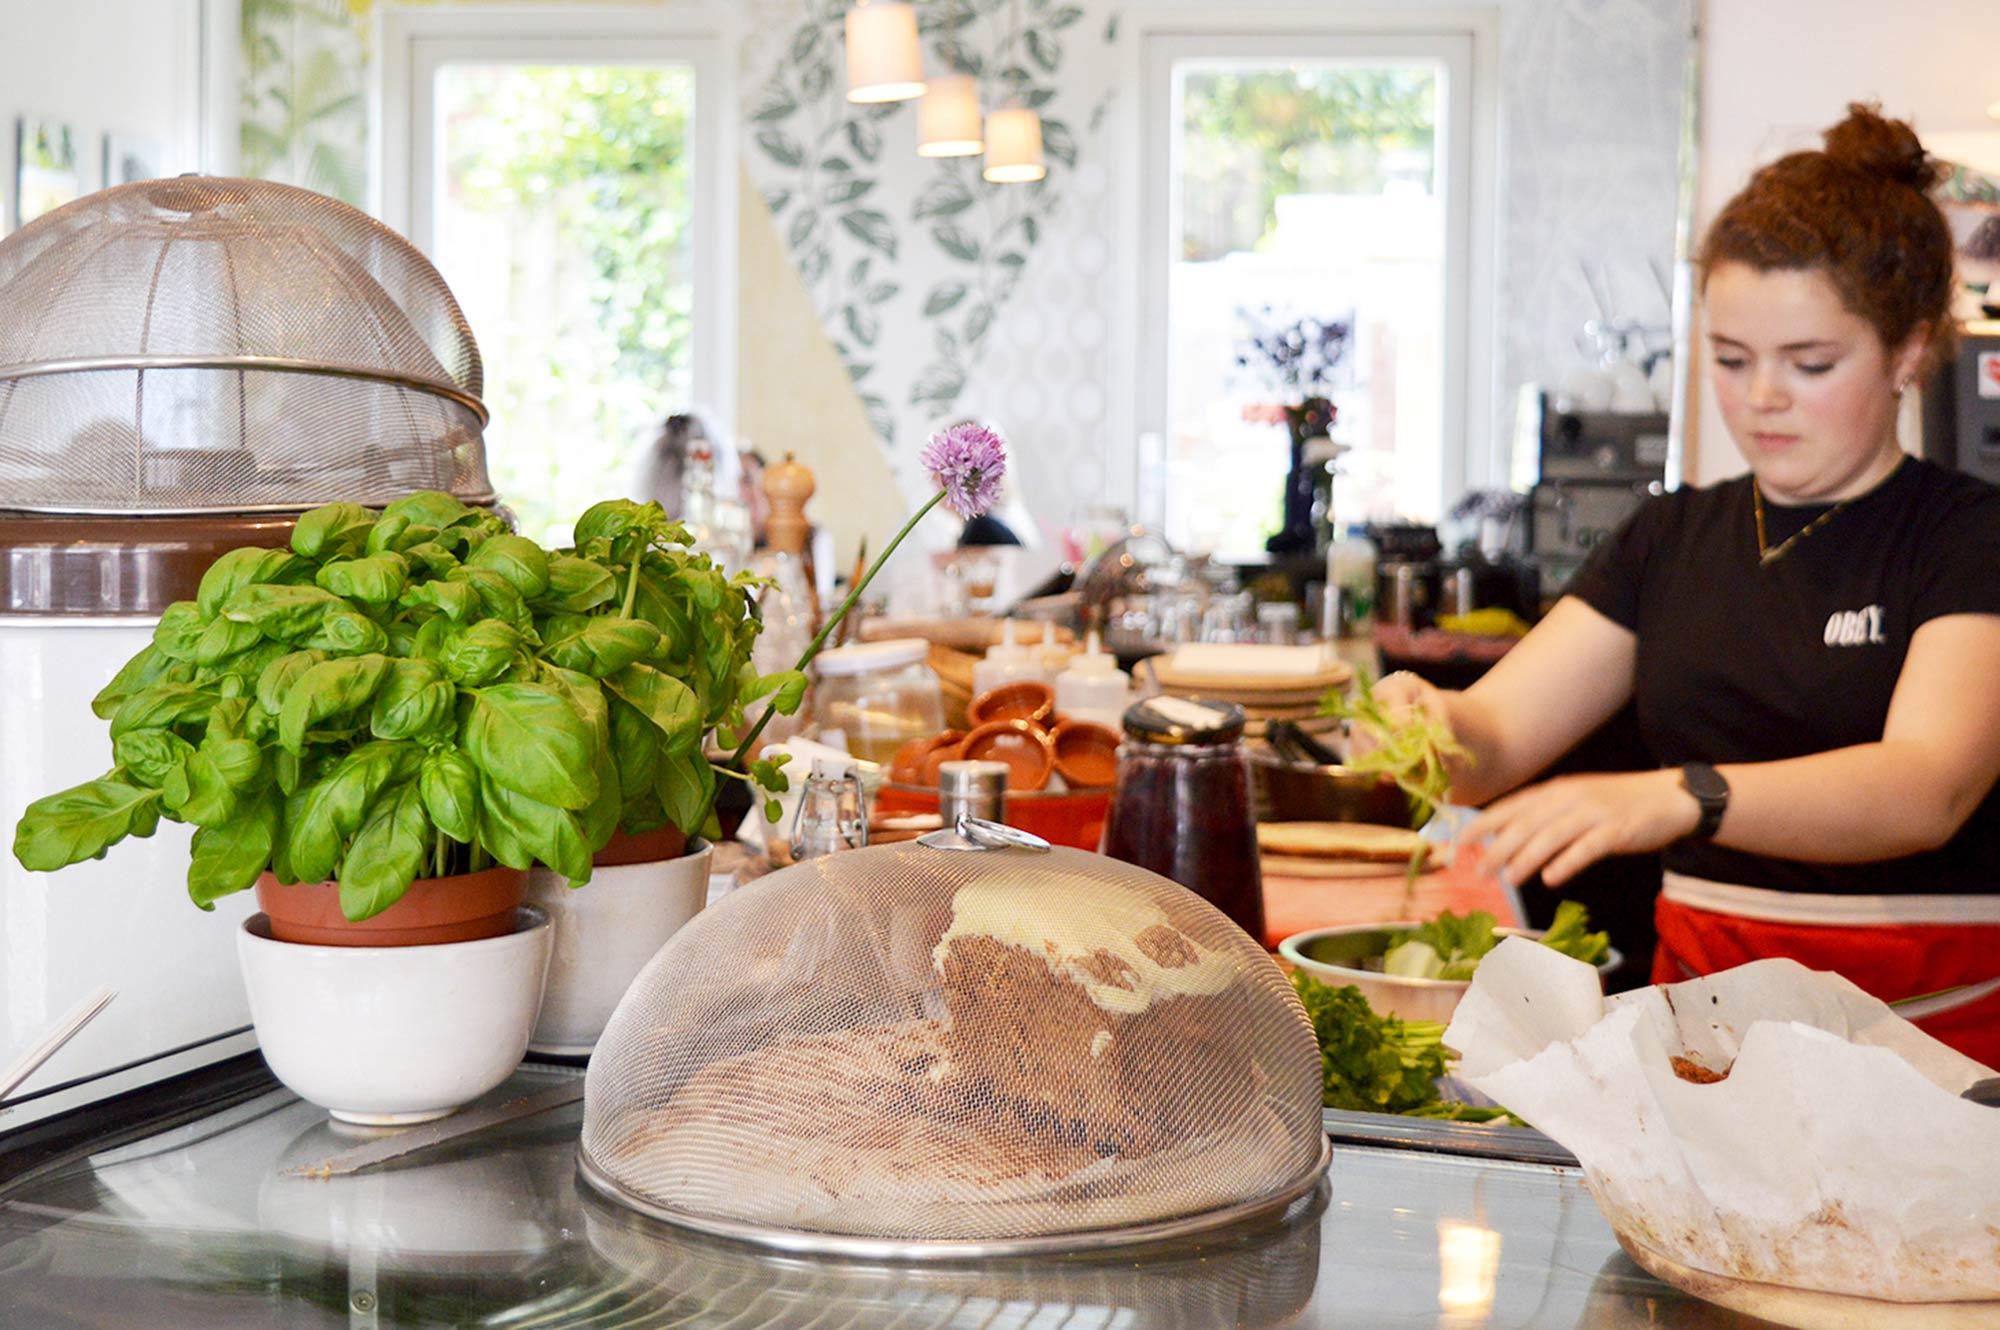 Restaurant Soepboer Amsterdam Noord © CoupleofMen.com